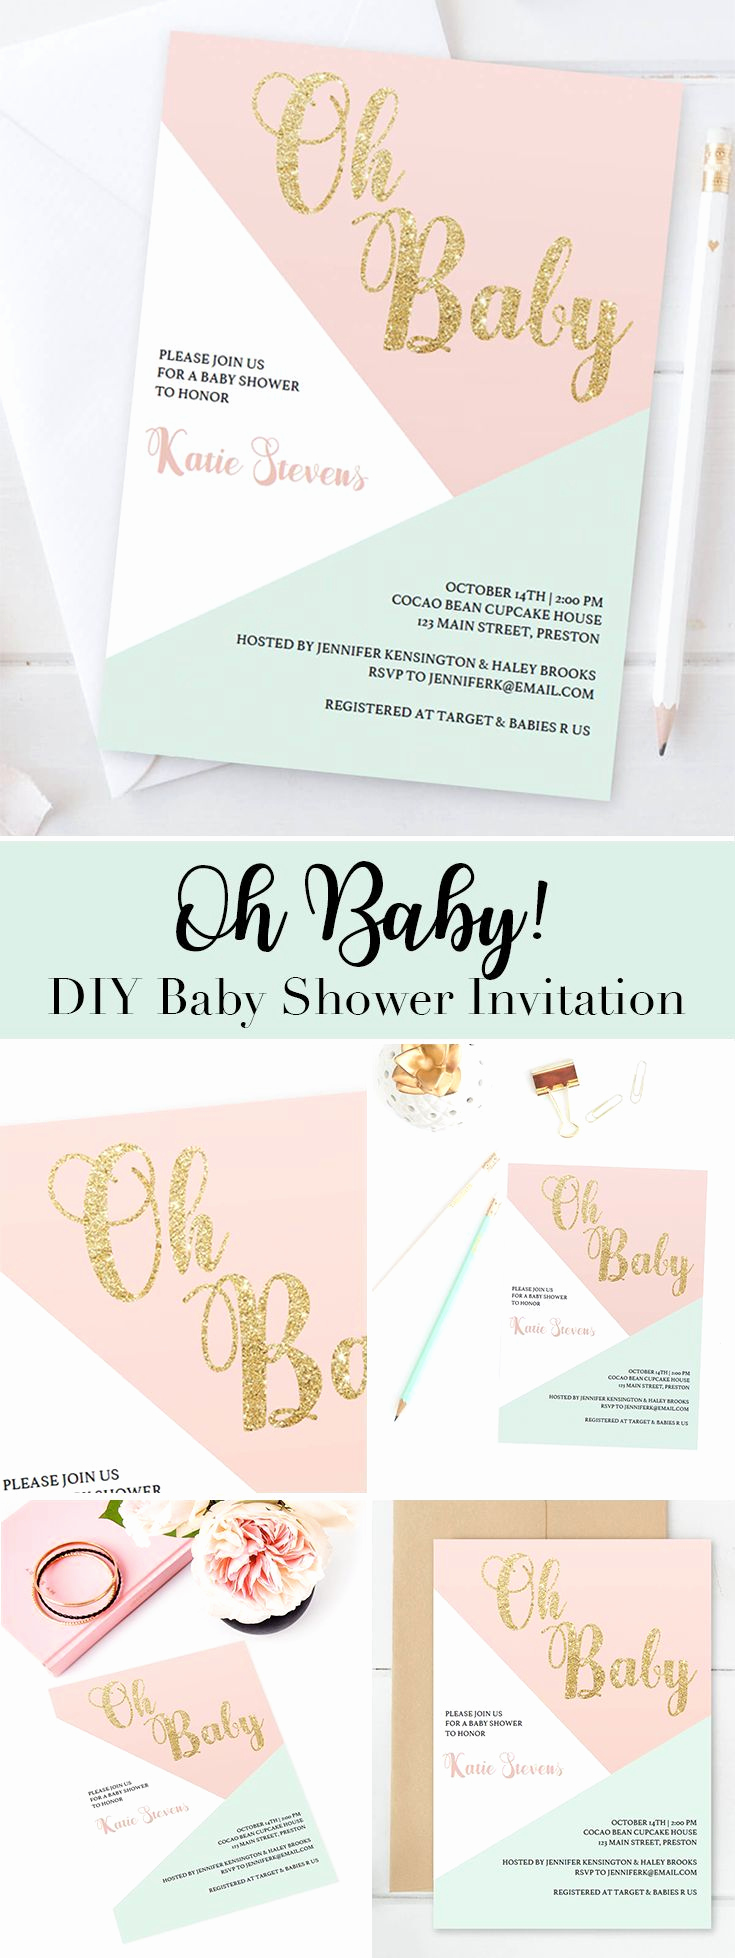 Baby Shower Invite Template Unique Best 25 Baby Shower Templates Ideas On Pinterest